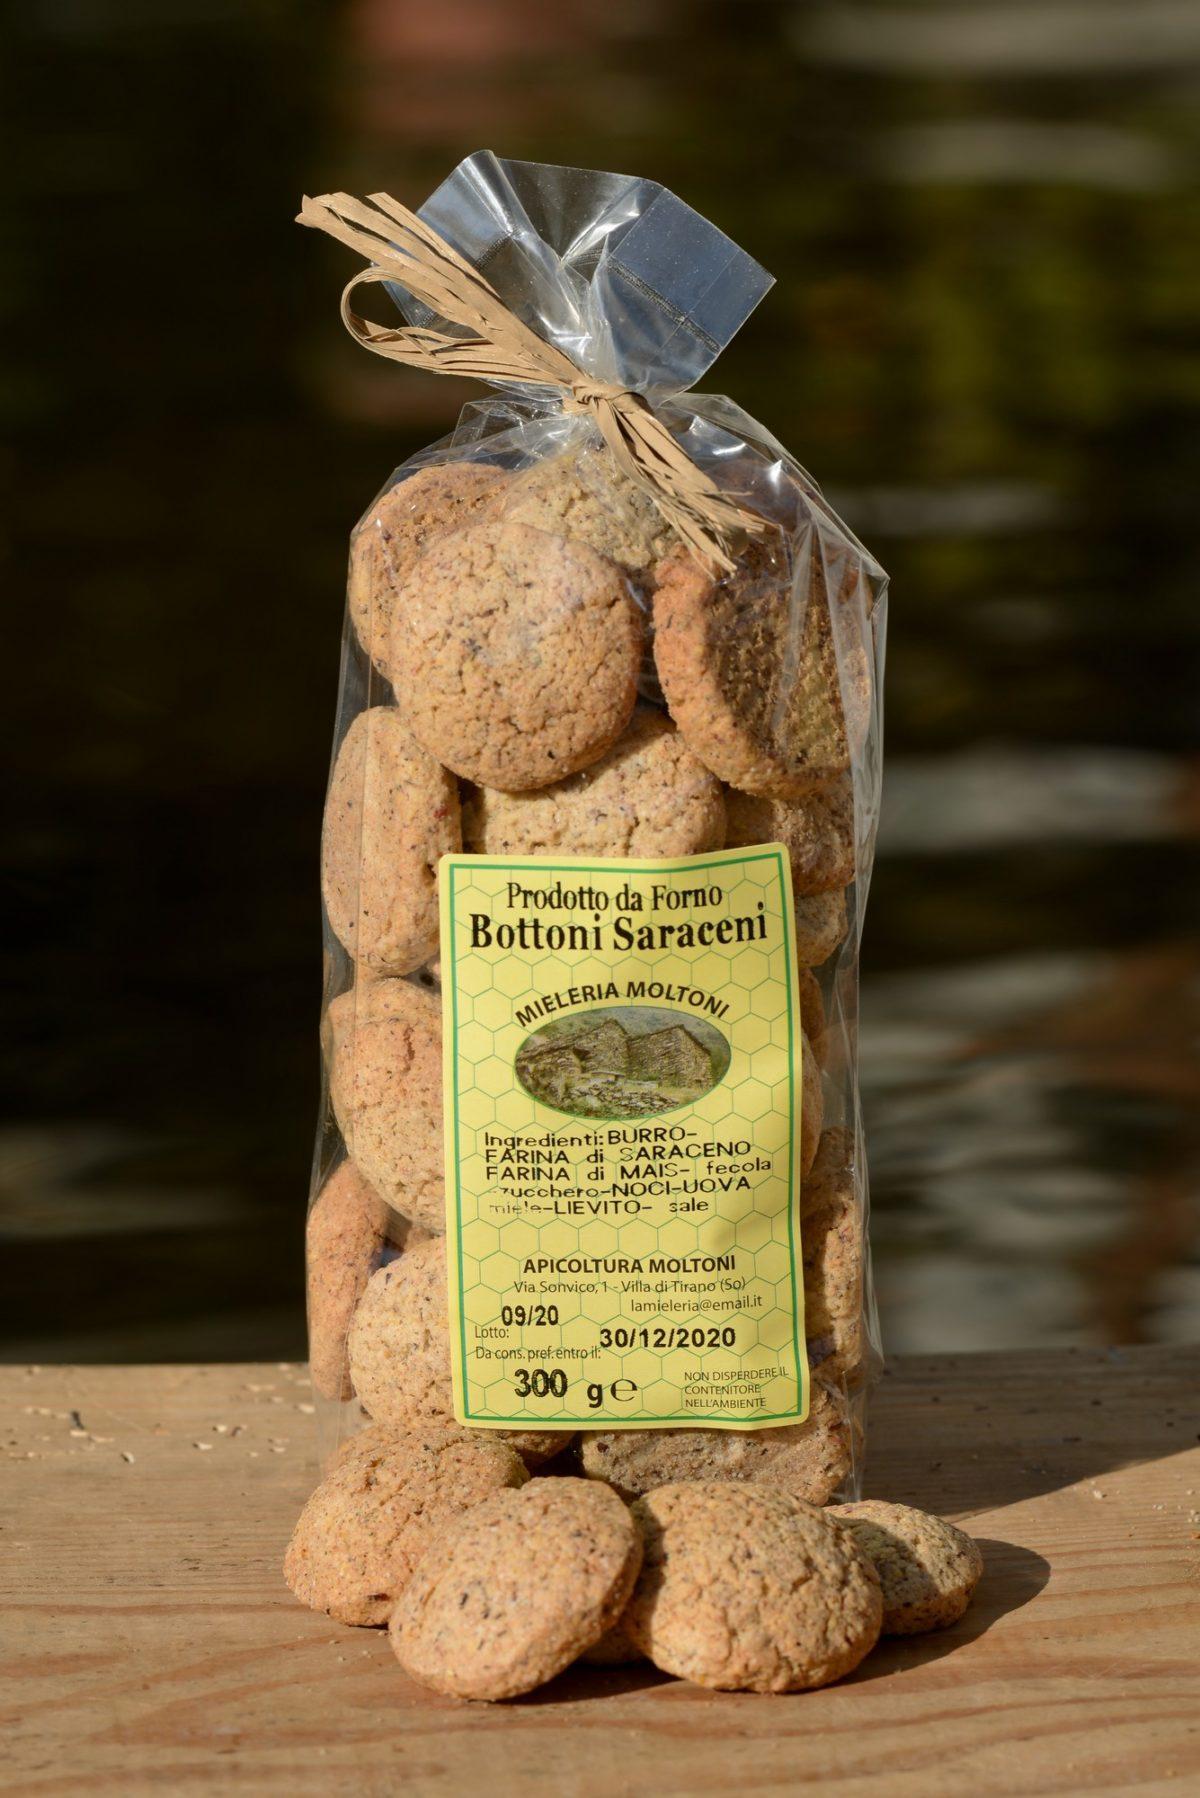 biscotti bottoni saraceni